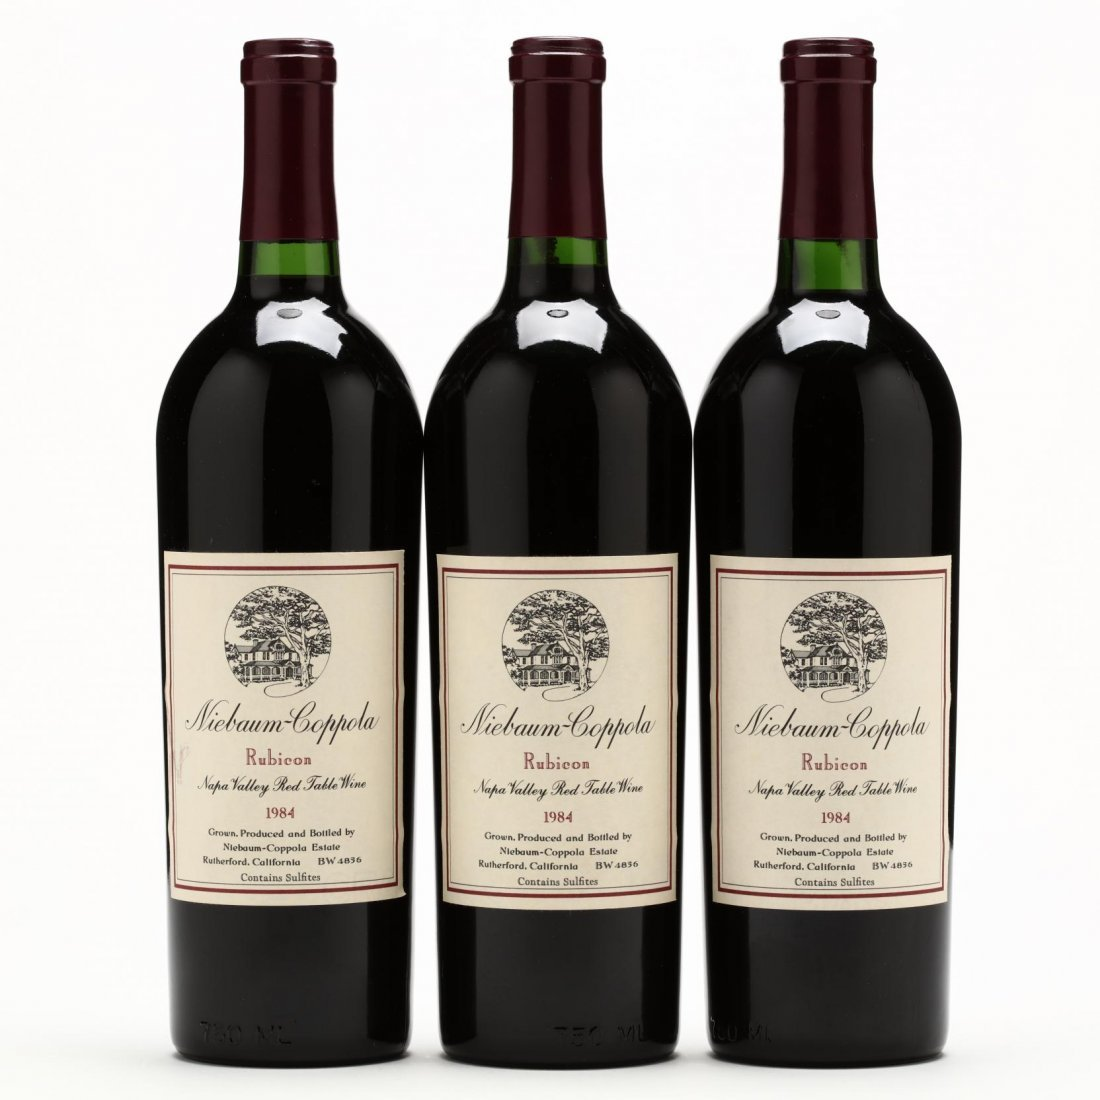 Niebaum-Coppola Winery - Vintage 1984